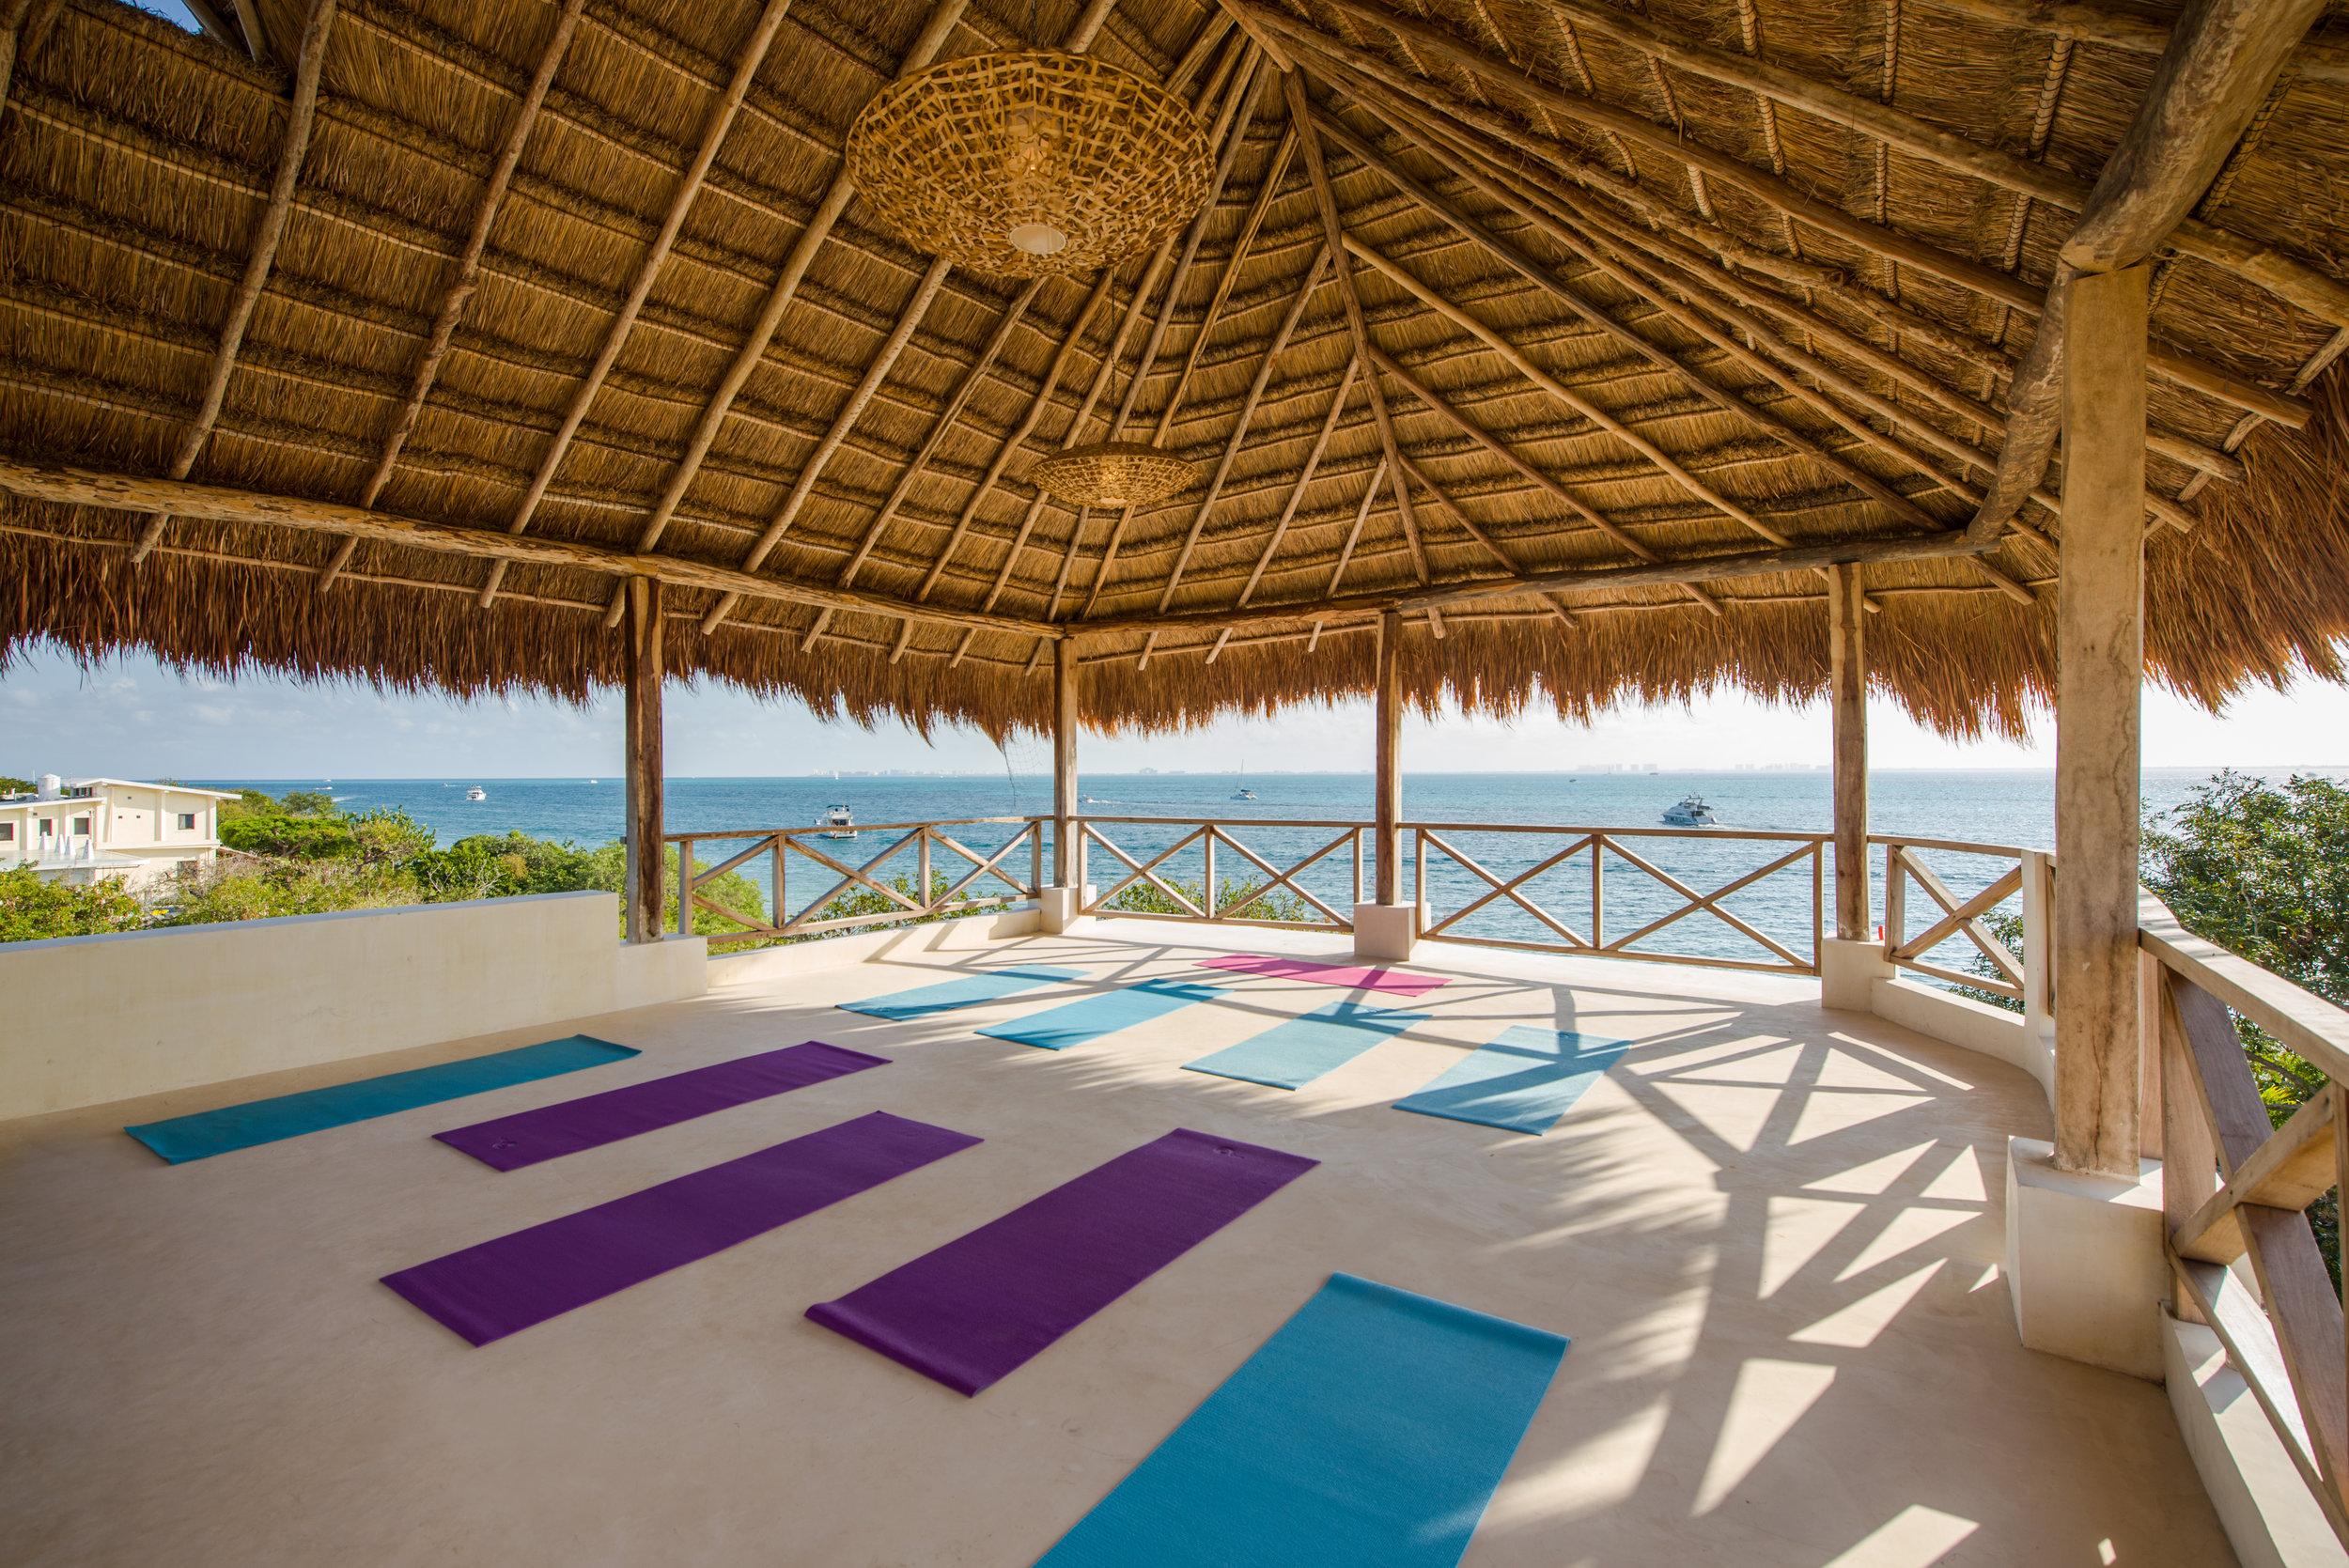 Casa Coco Isla Mujeres-7377.jpg